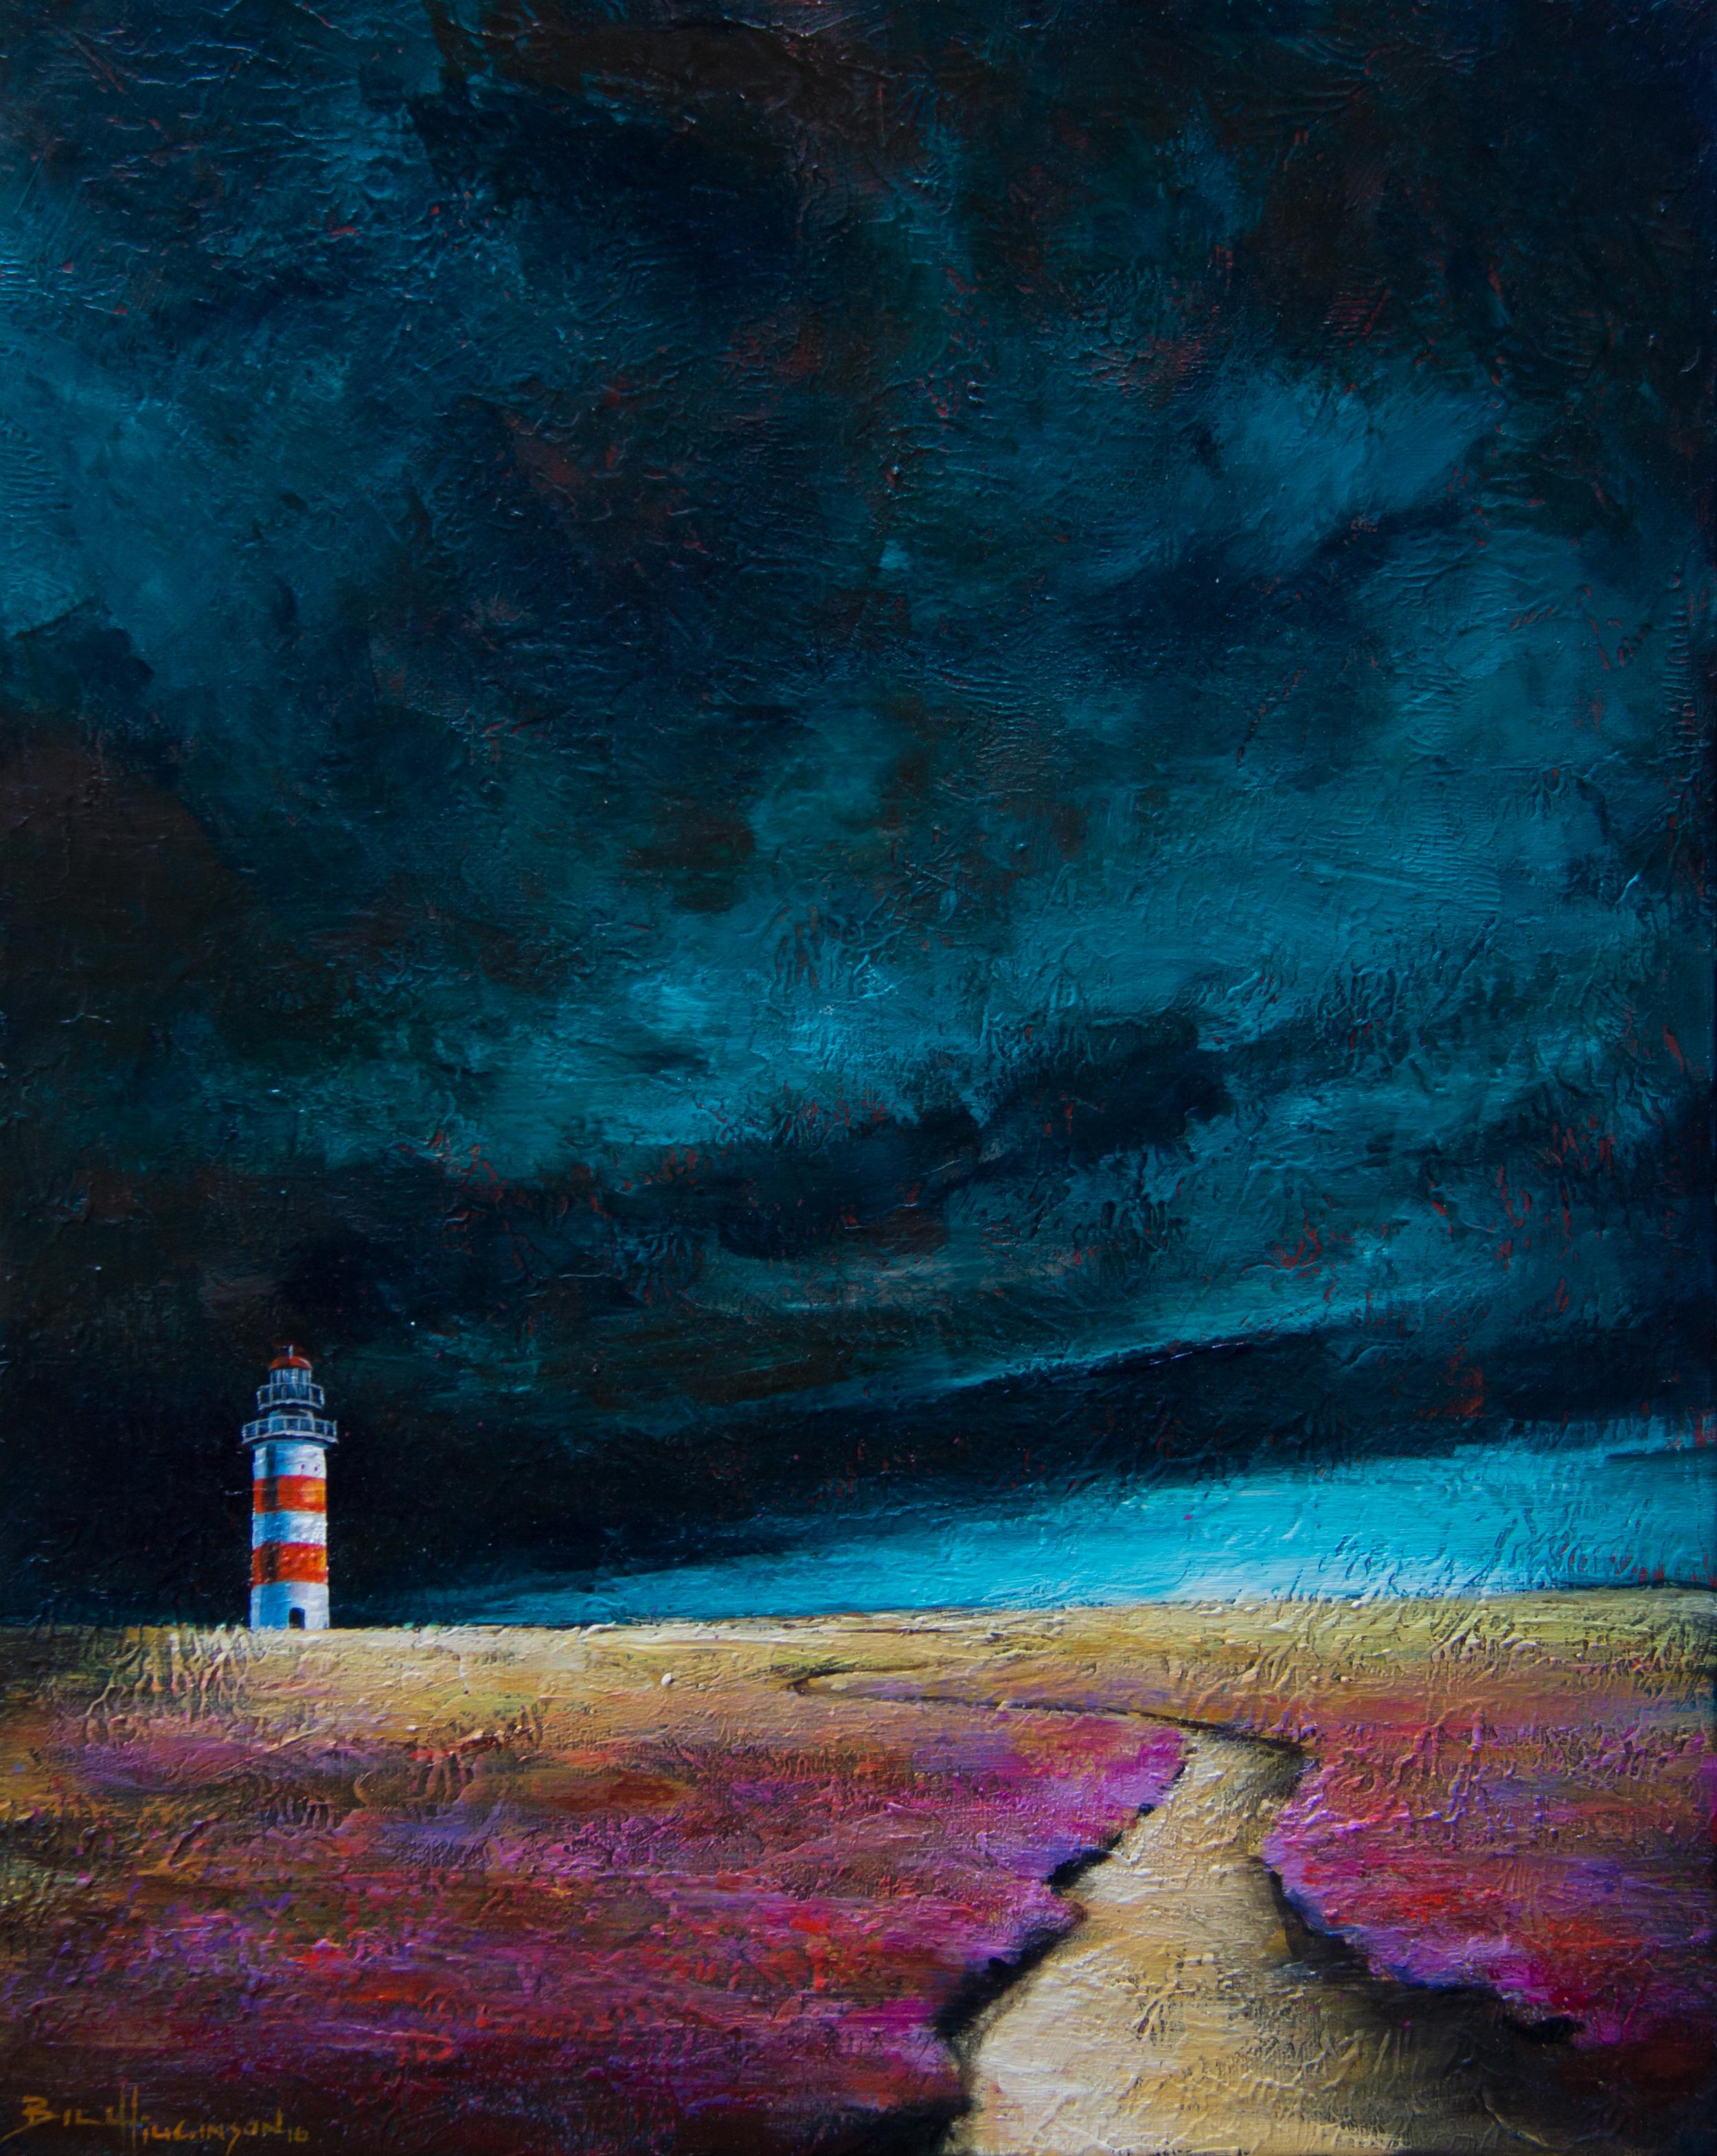 bill-higginson/art/turquoise-storm/abstract-landscape-surrealism